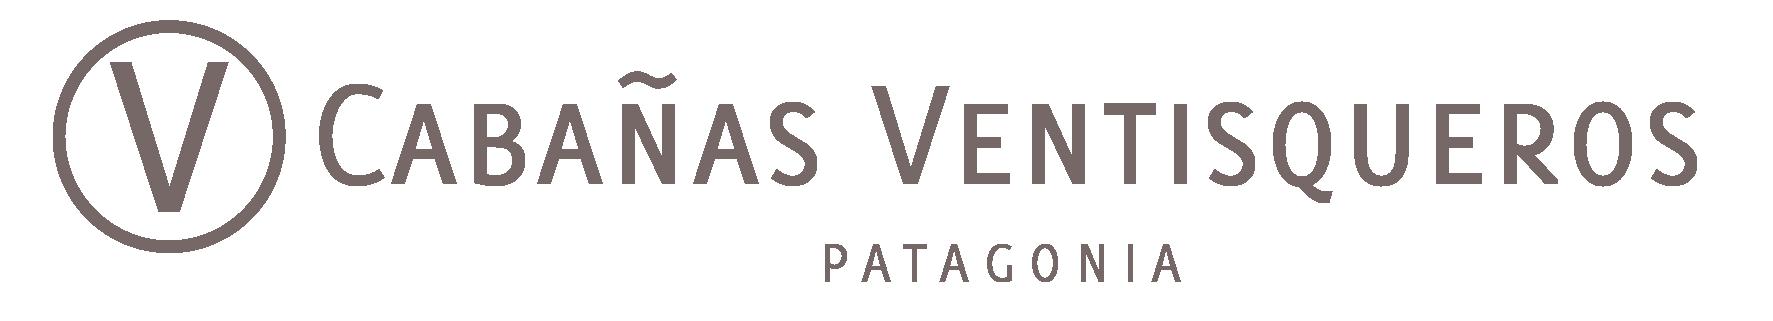 logo_ventisqueros